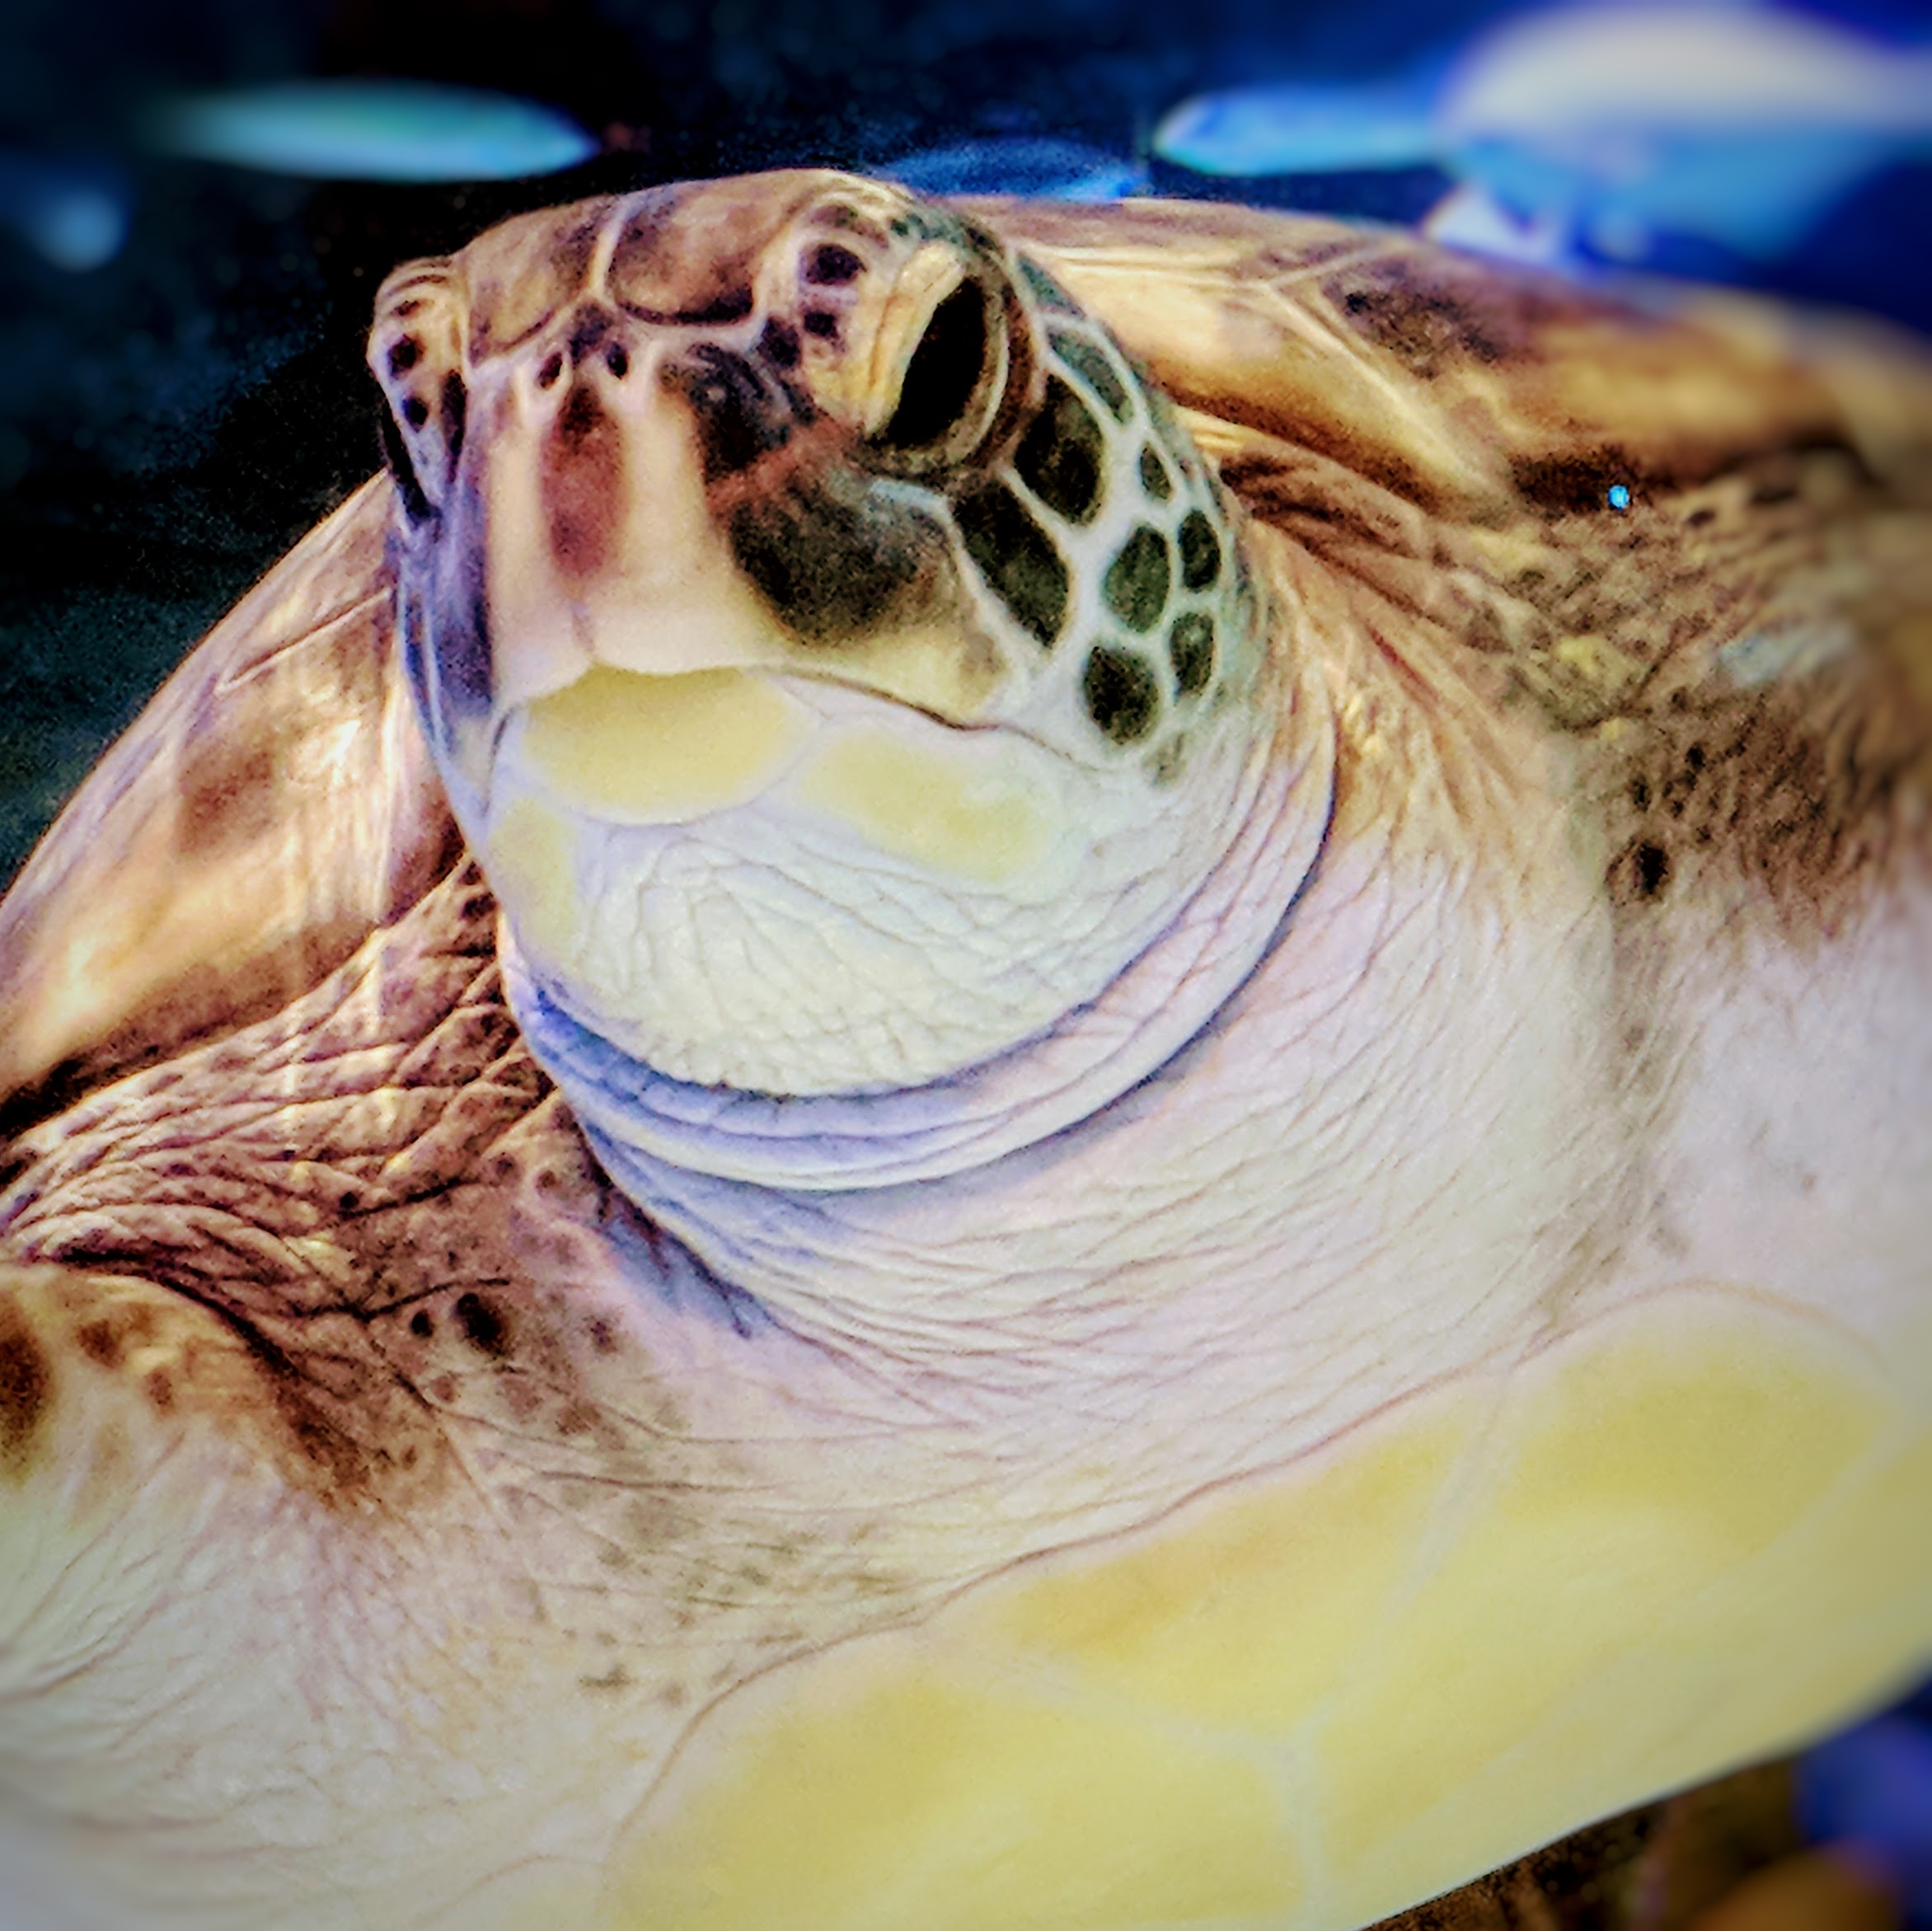 Aquarium turtle looking  grumpy